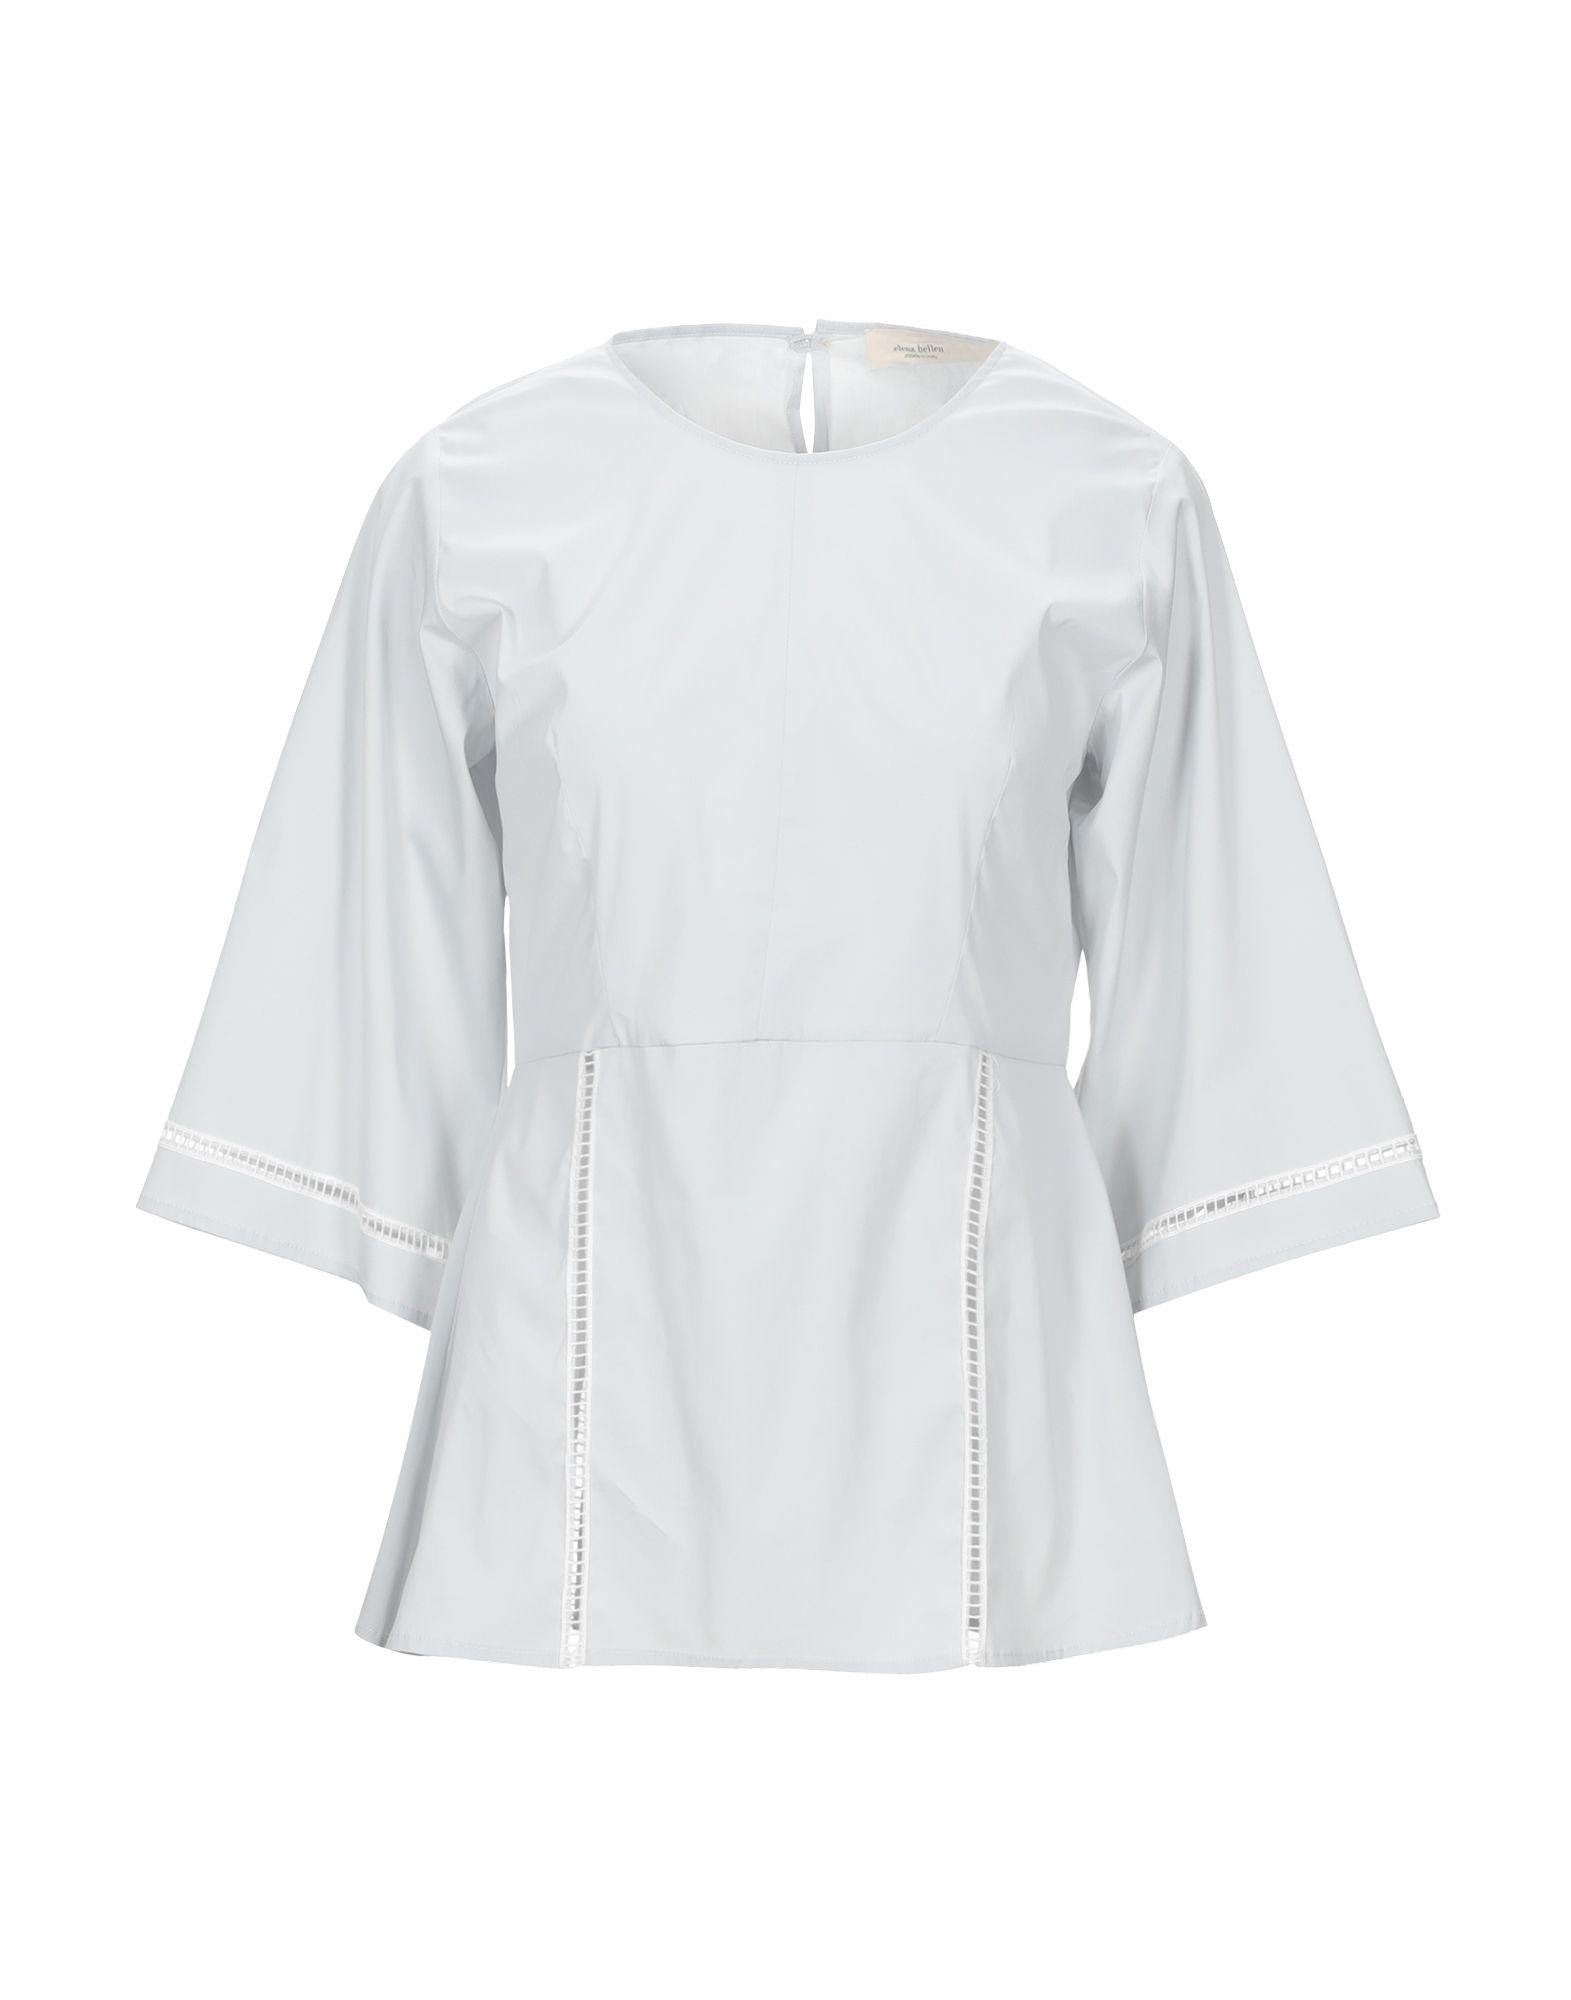 ELENA HELLEN Блузка рубашка блузка for me elena miro рубашка блузка